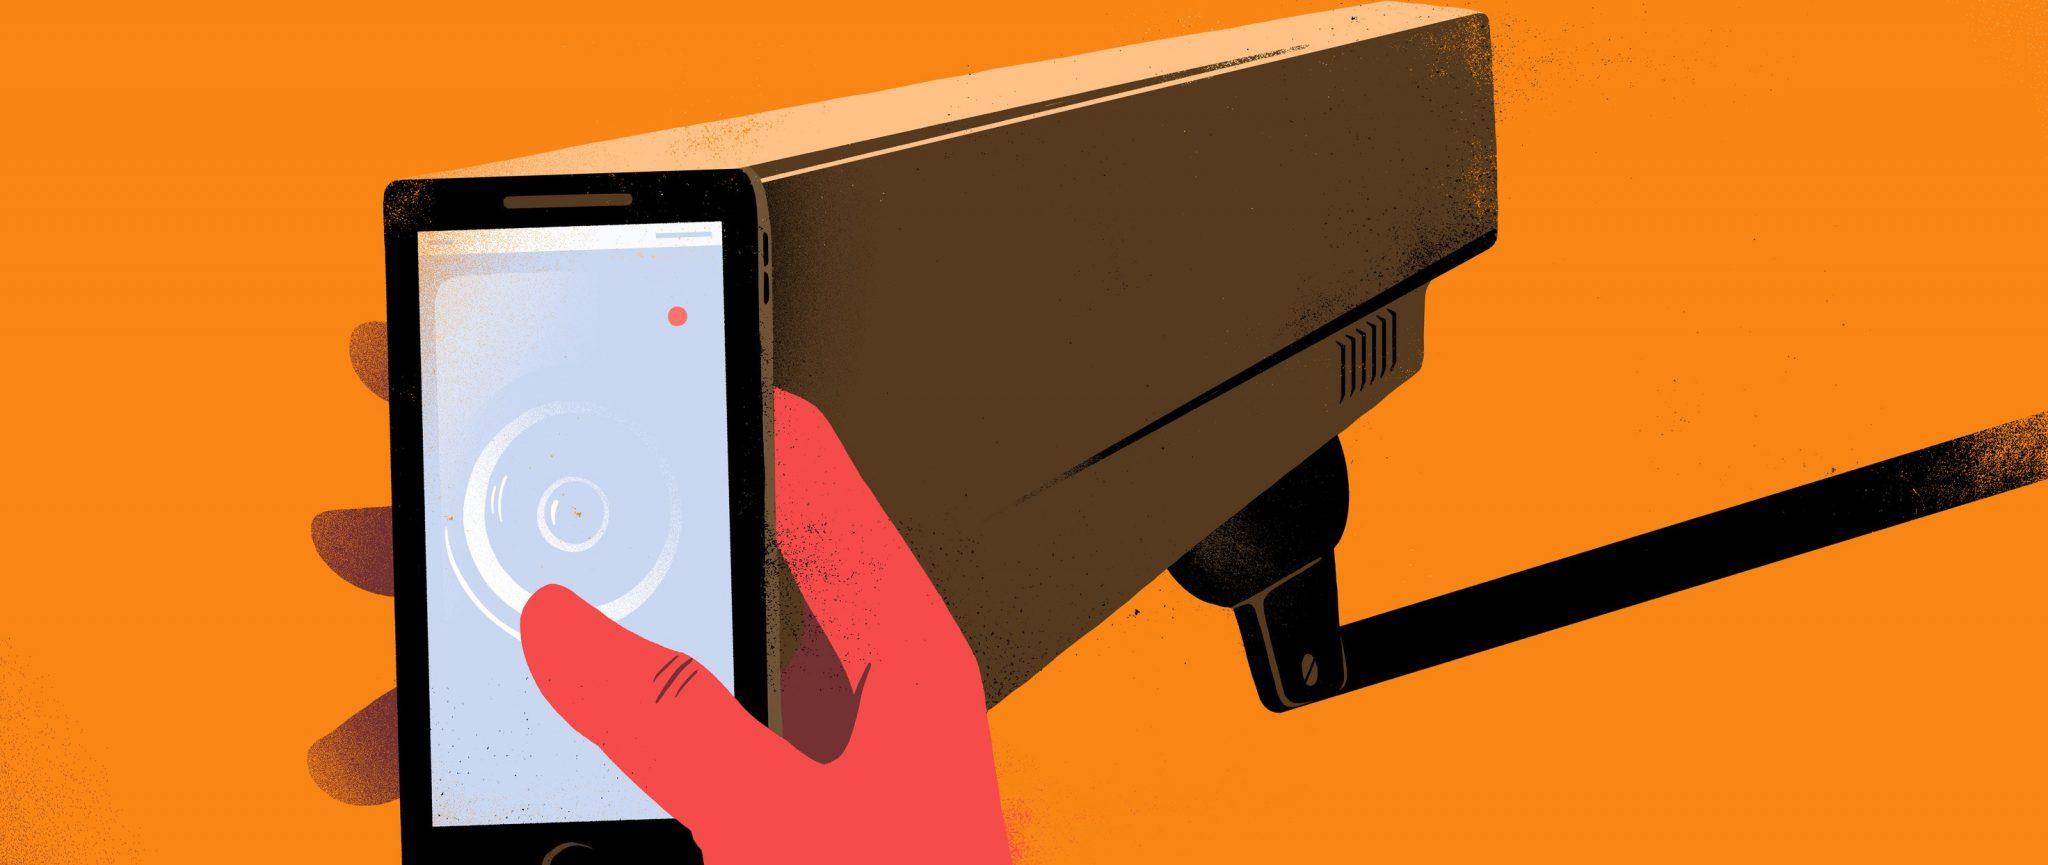 Digital surveillance threats for 2020